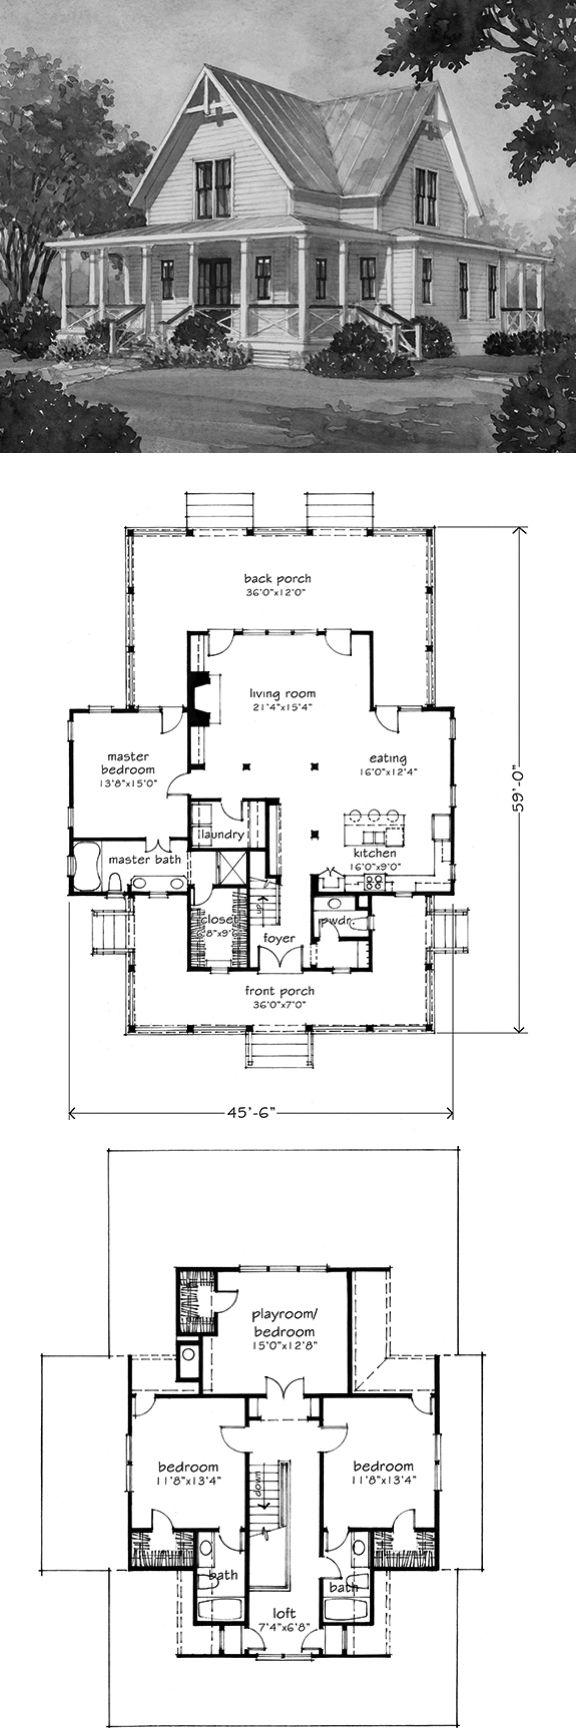 2341 sq ft 4 bedrooms 3 5 baths